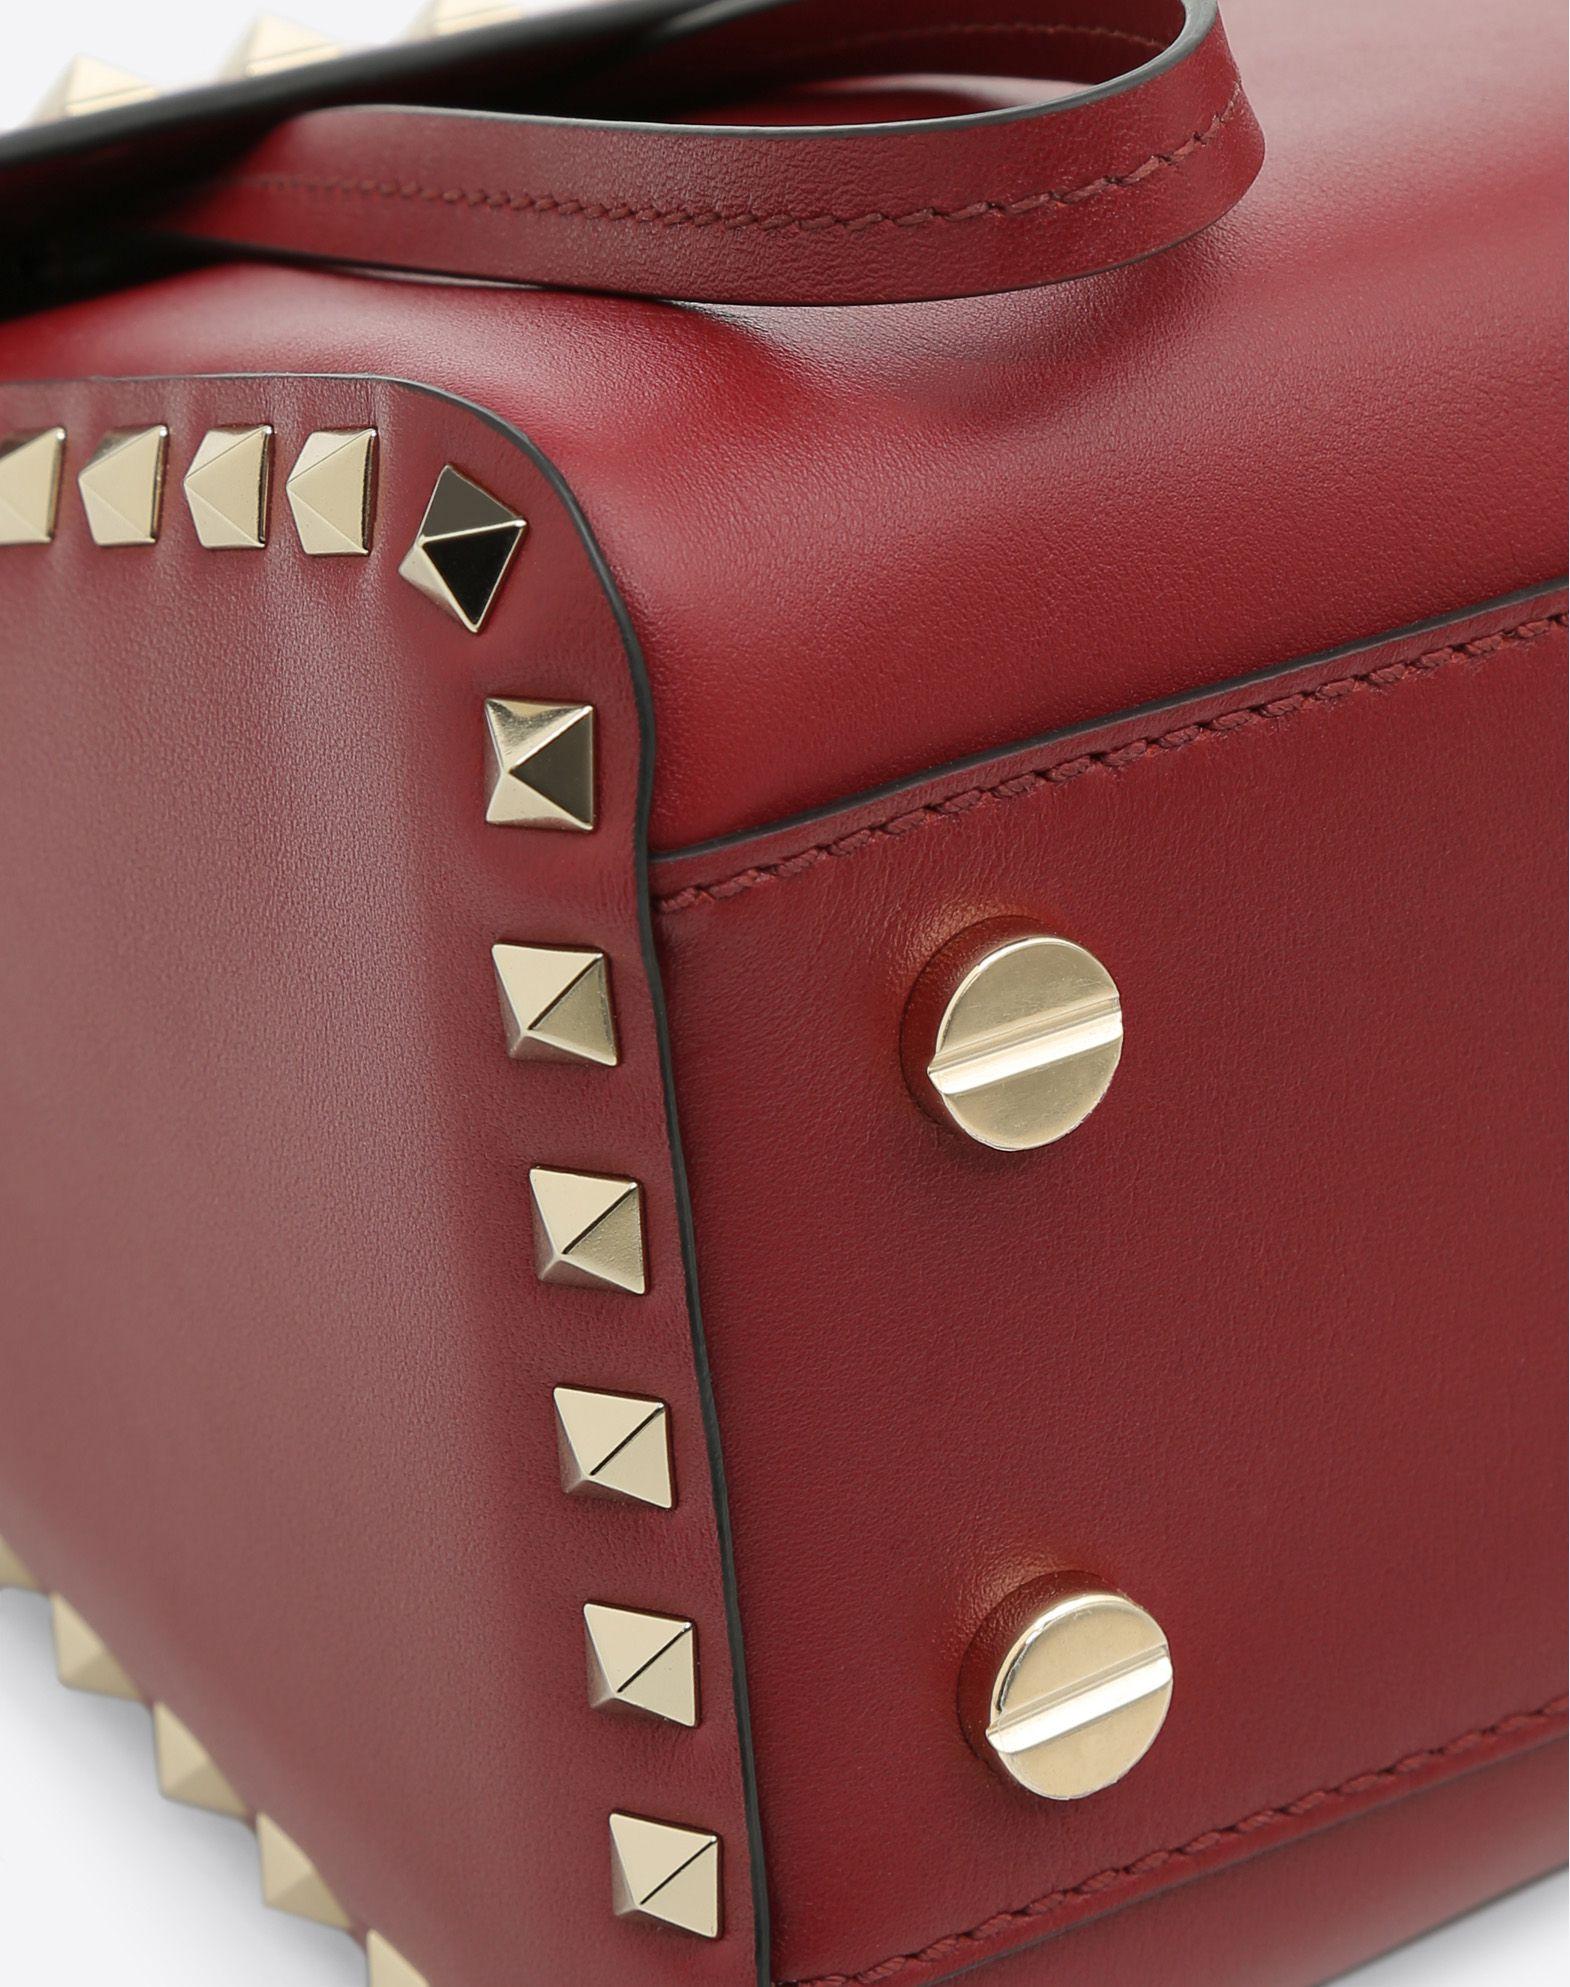 VALENTINO GARAVANI Rockstud Single Handle Bag HANDBAG D b